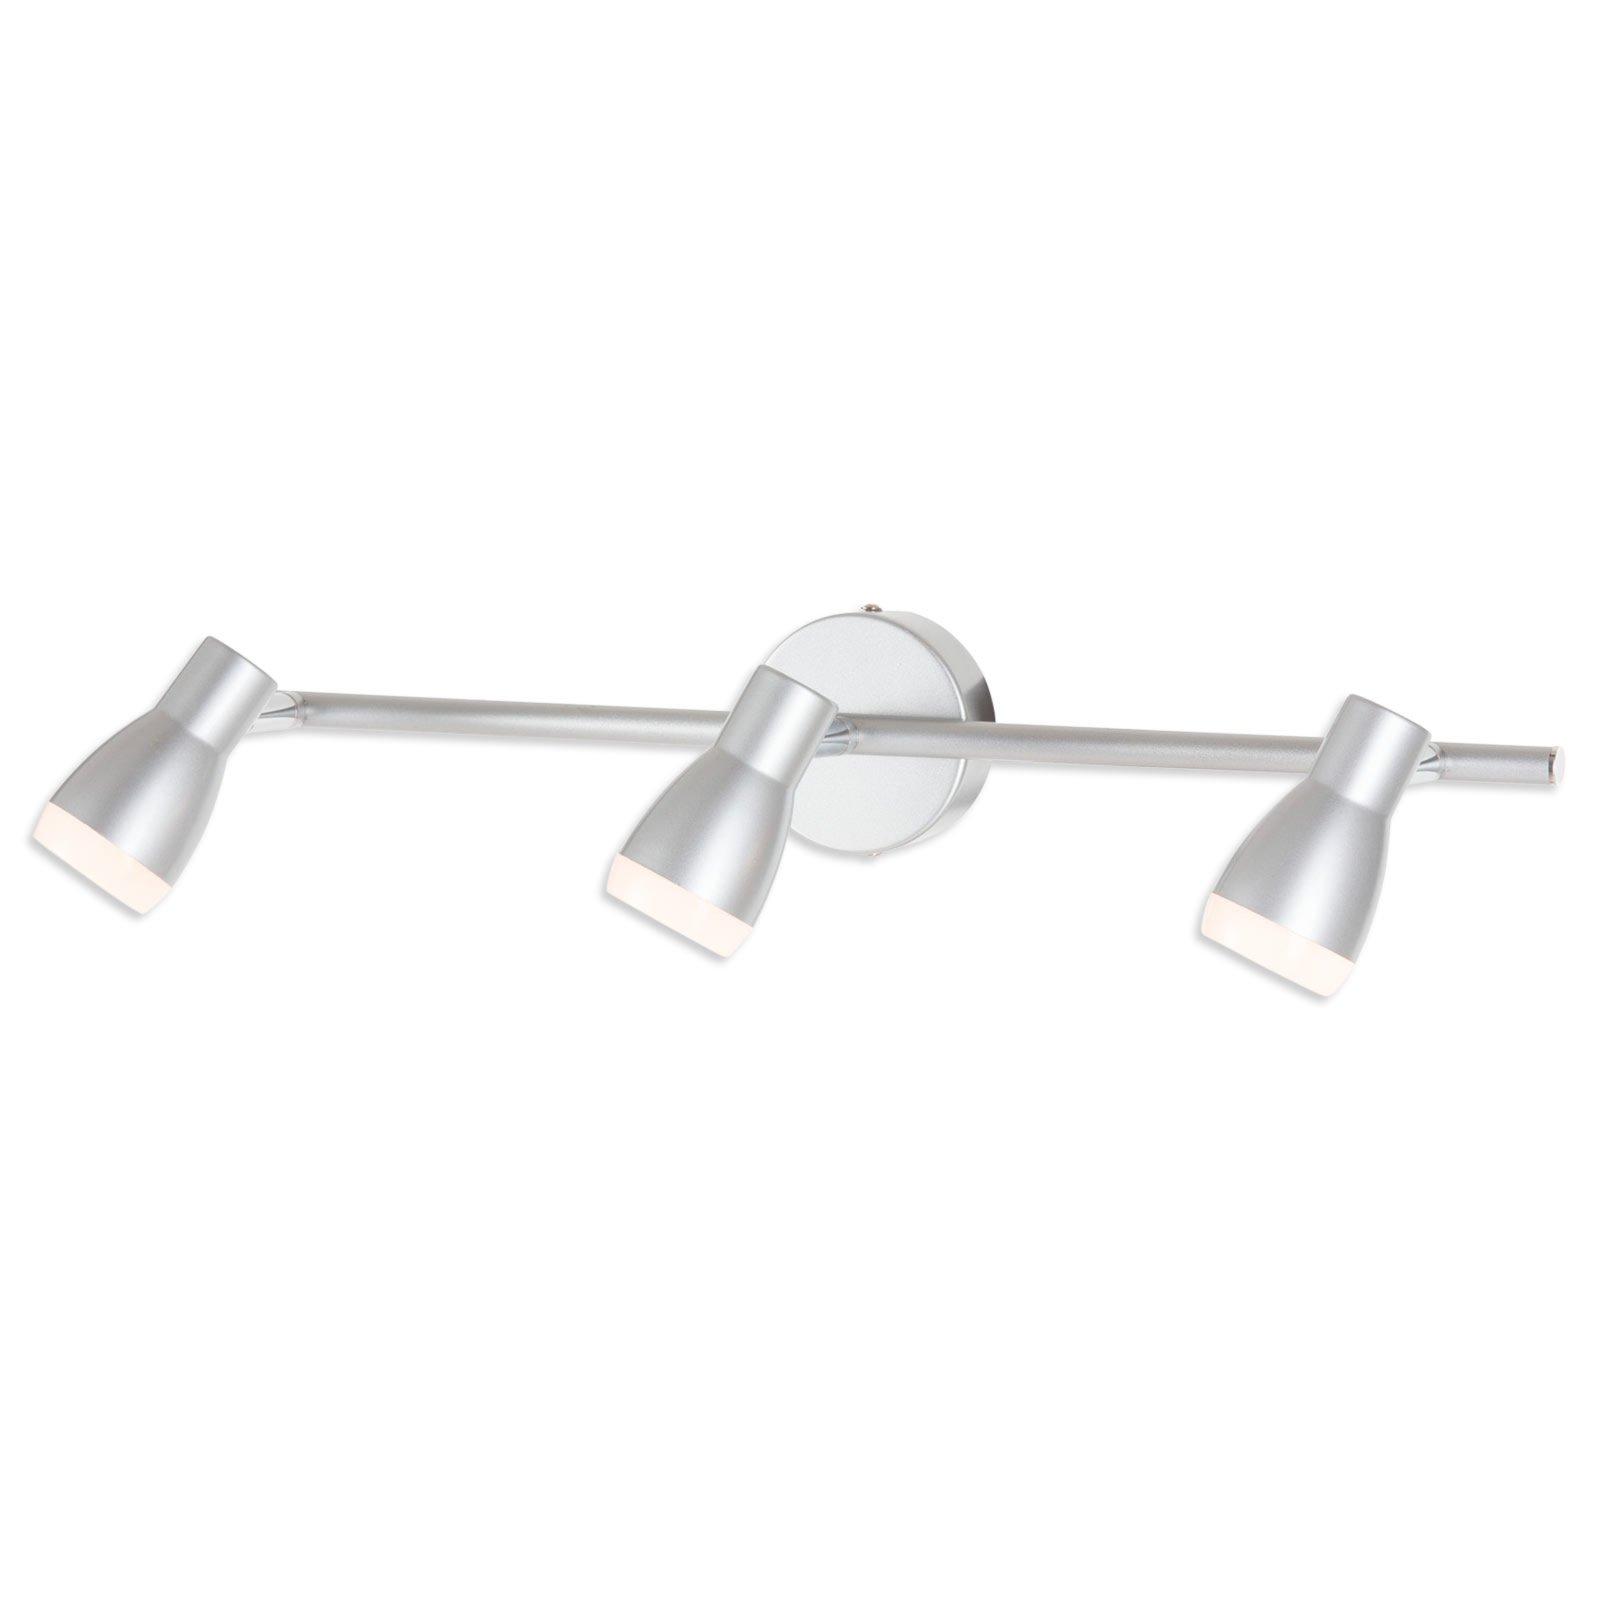 LED-Spotbalken MEDINA - silber - 3-flammig